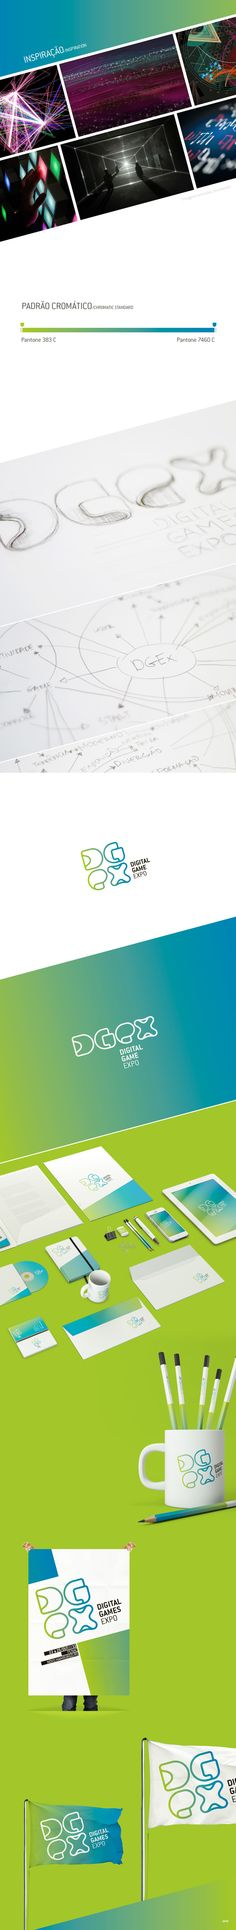 DGEX on Behance